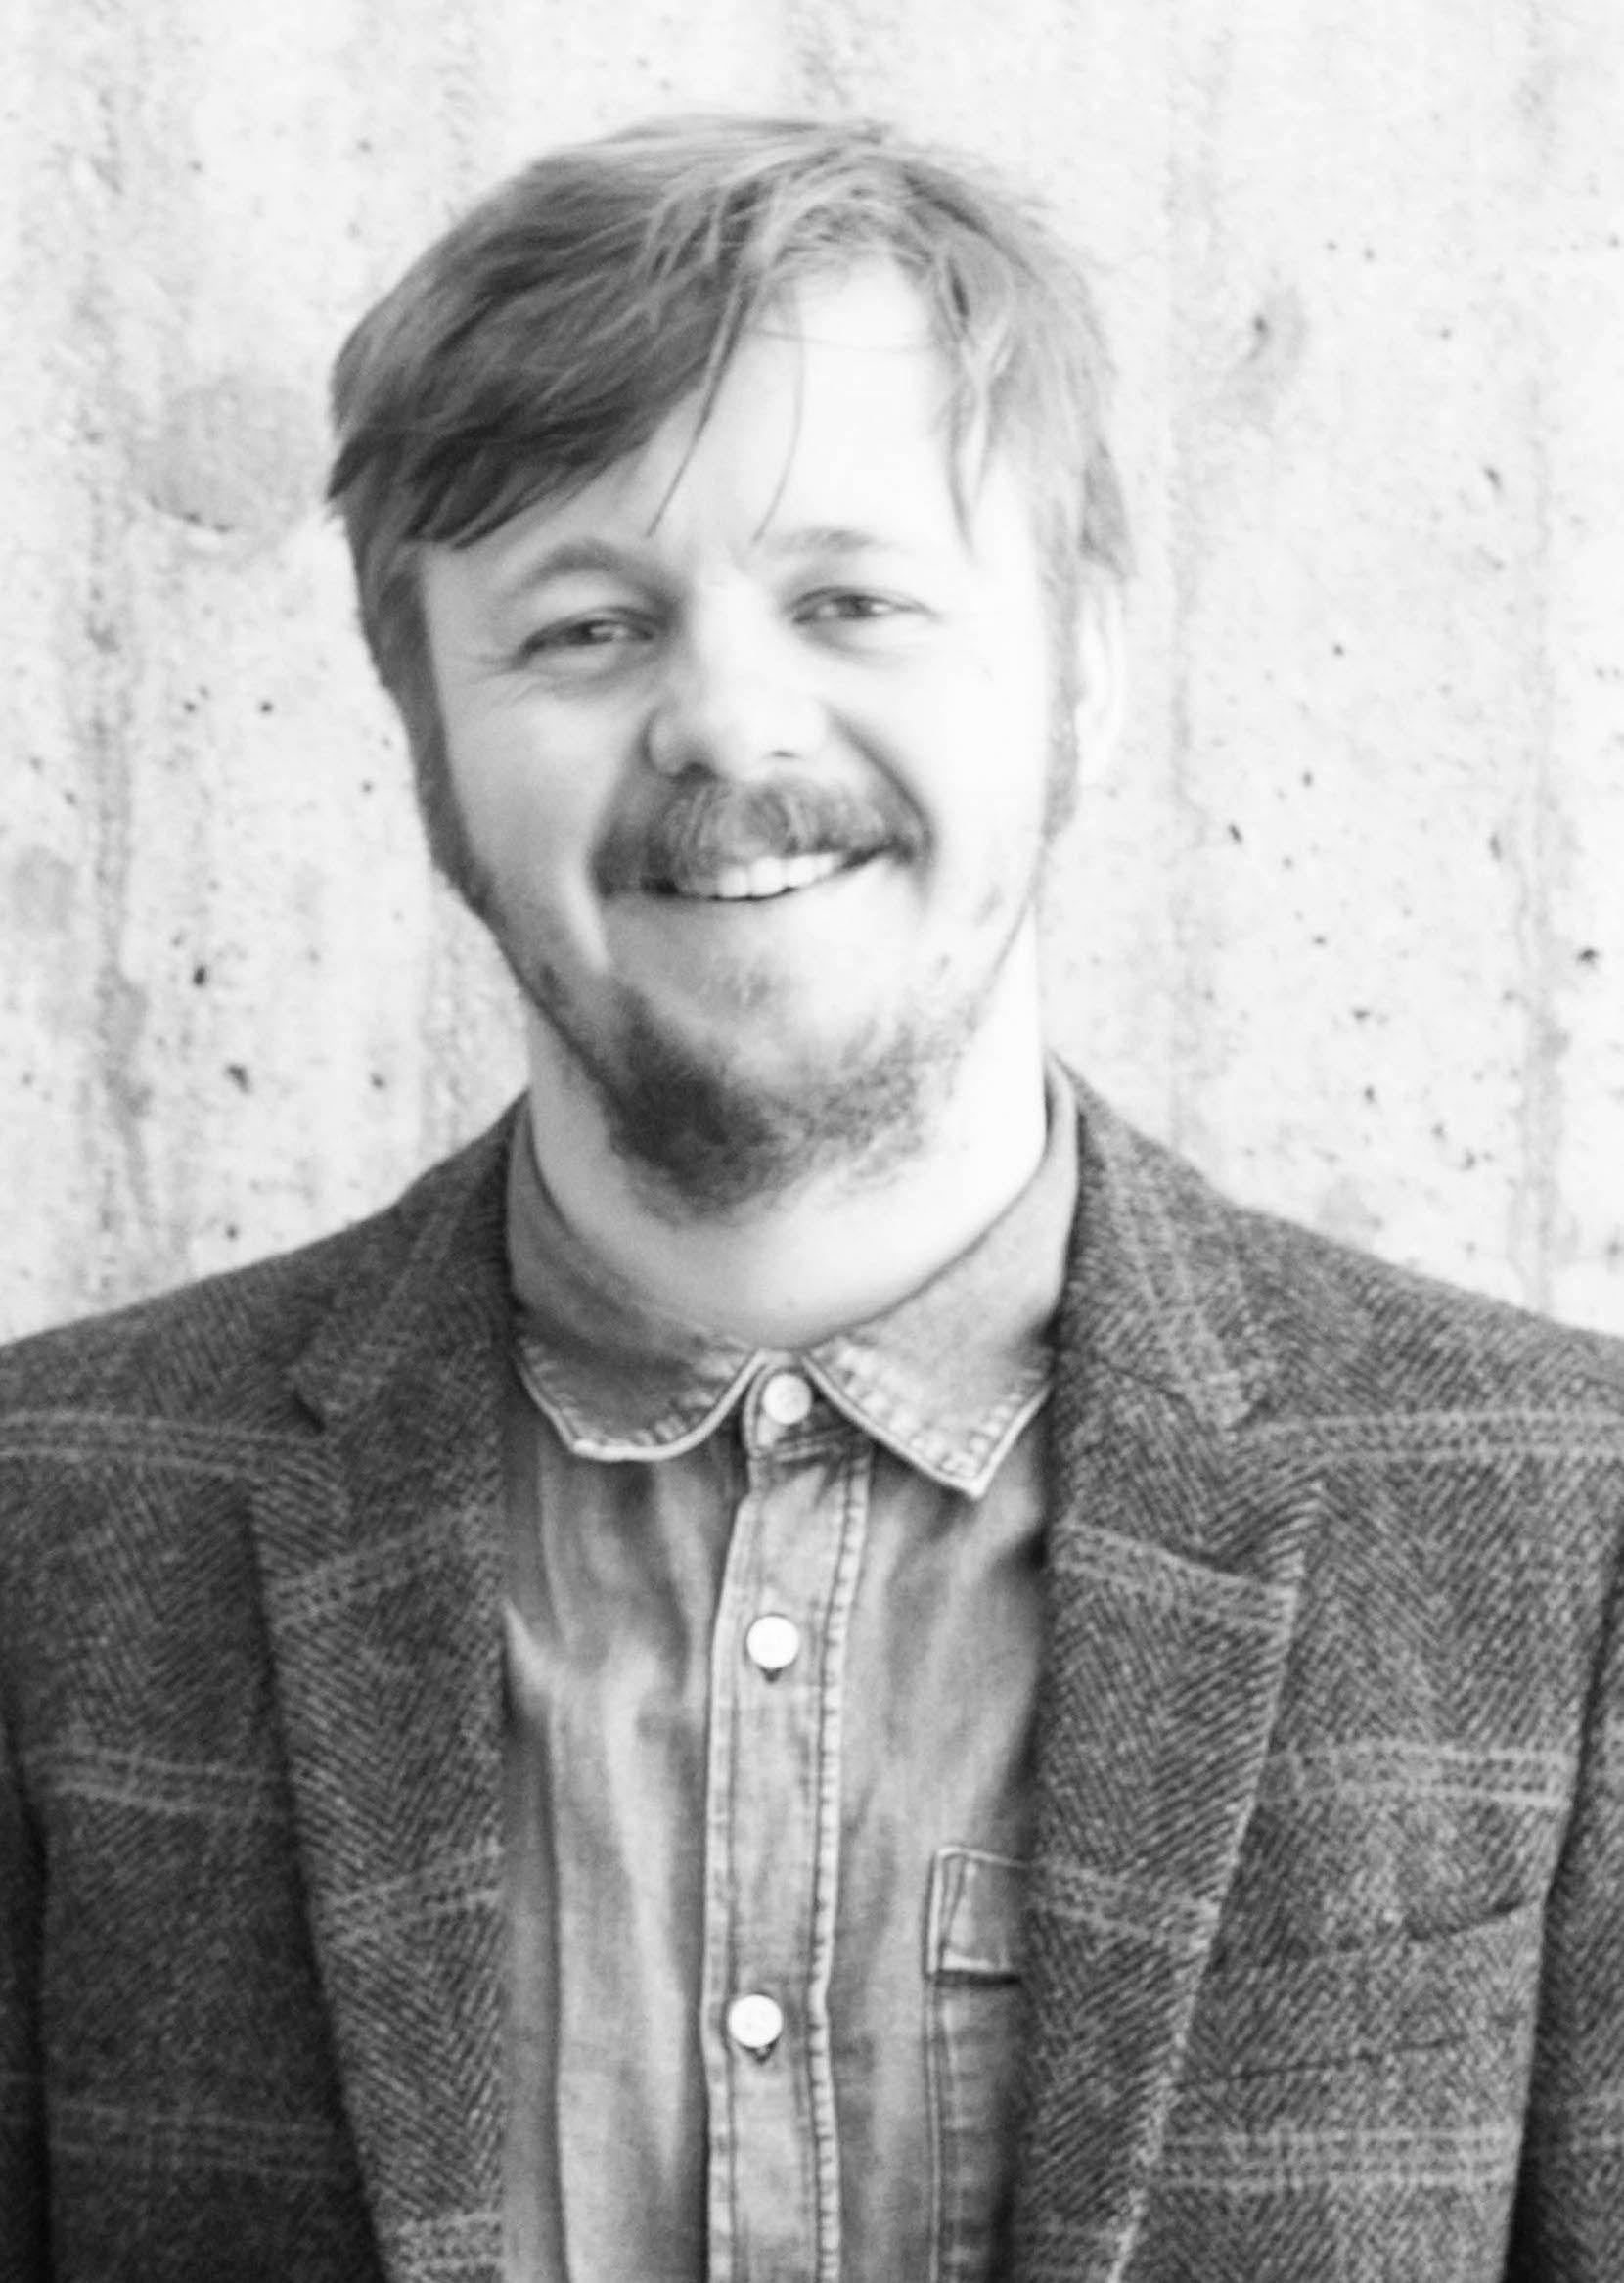 Daniel Bolstad-Hageland